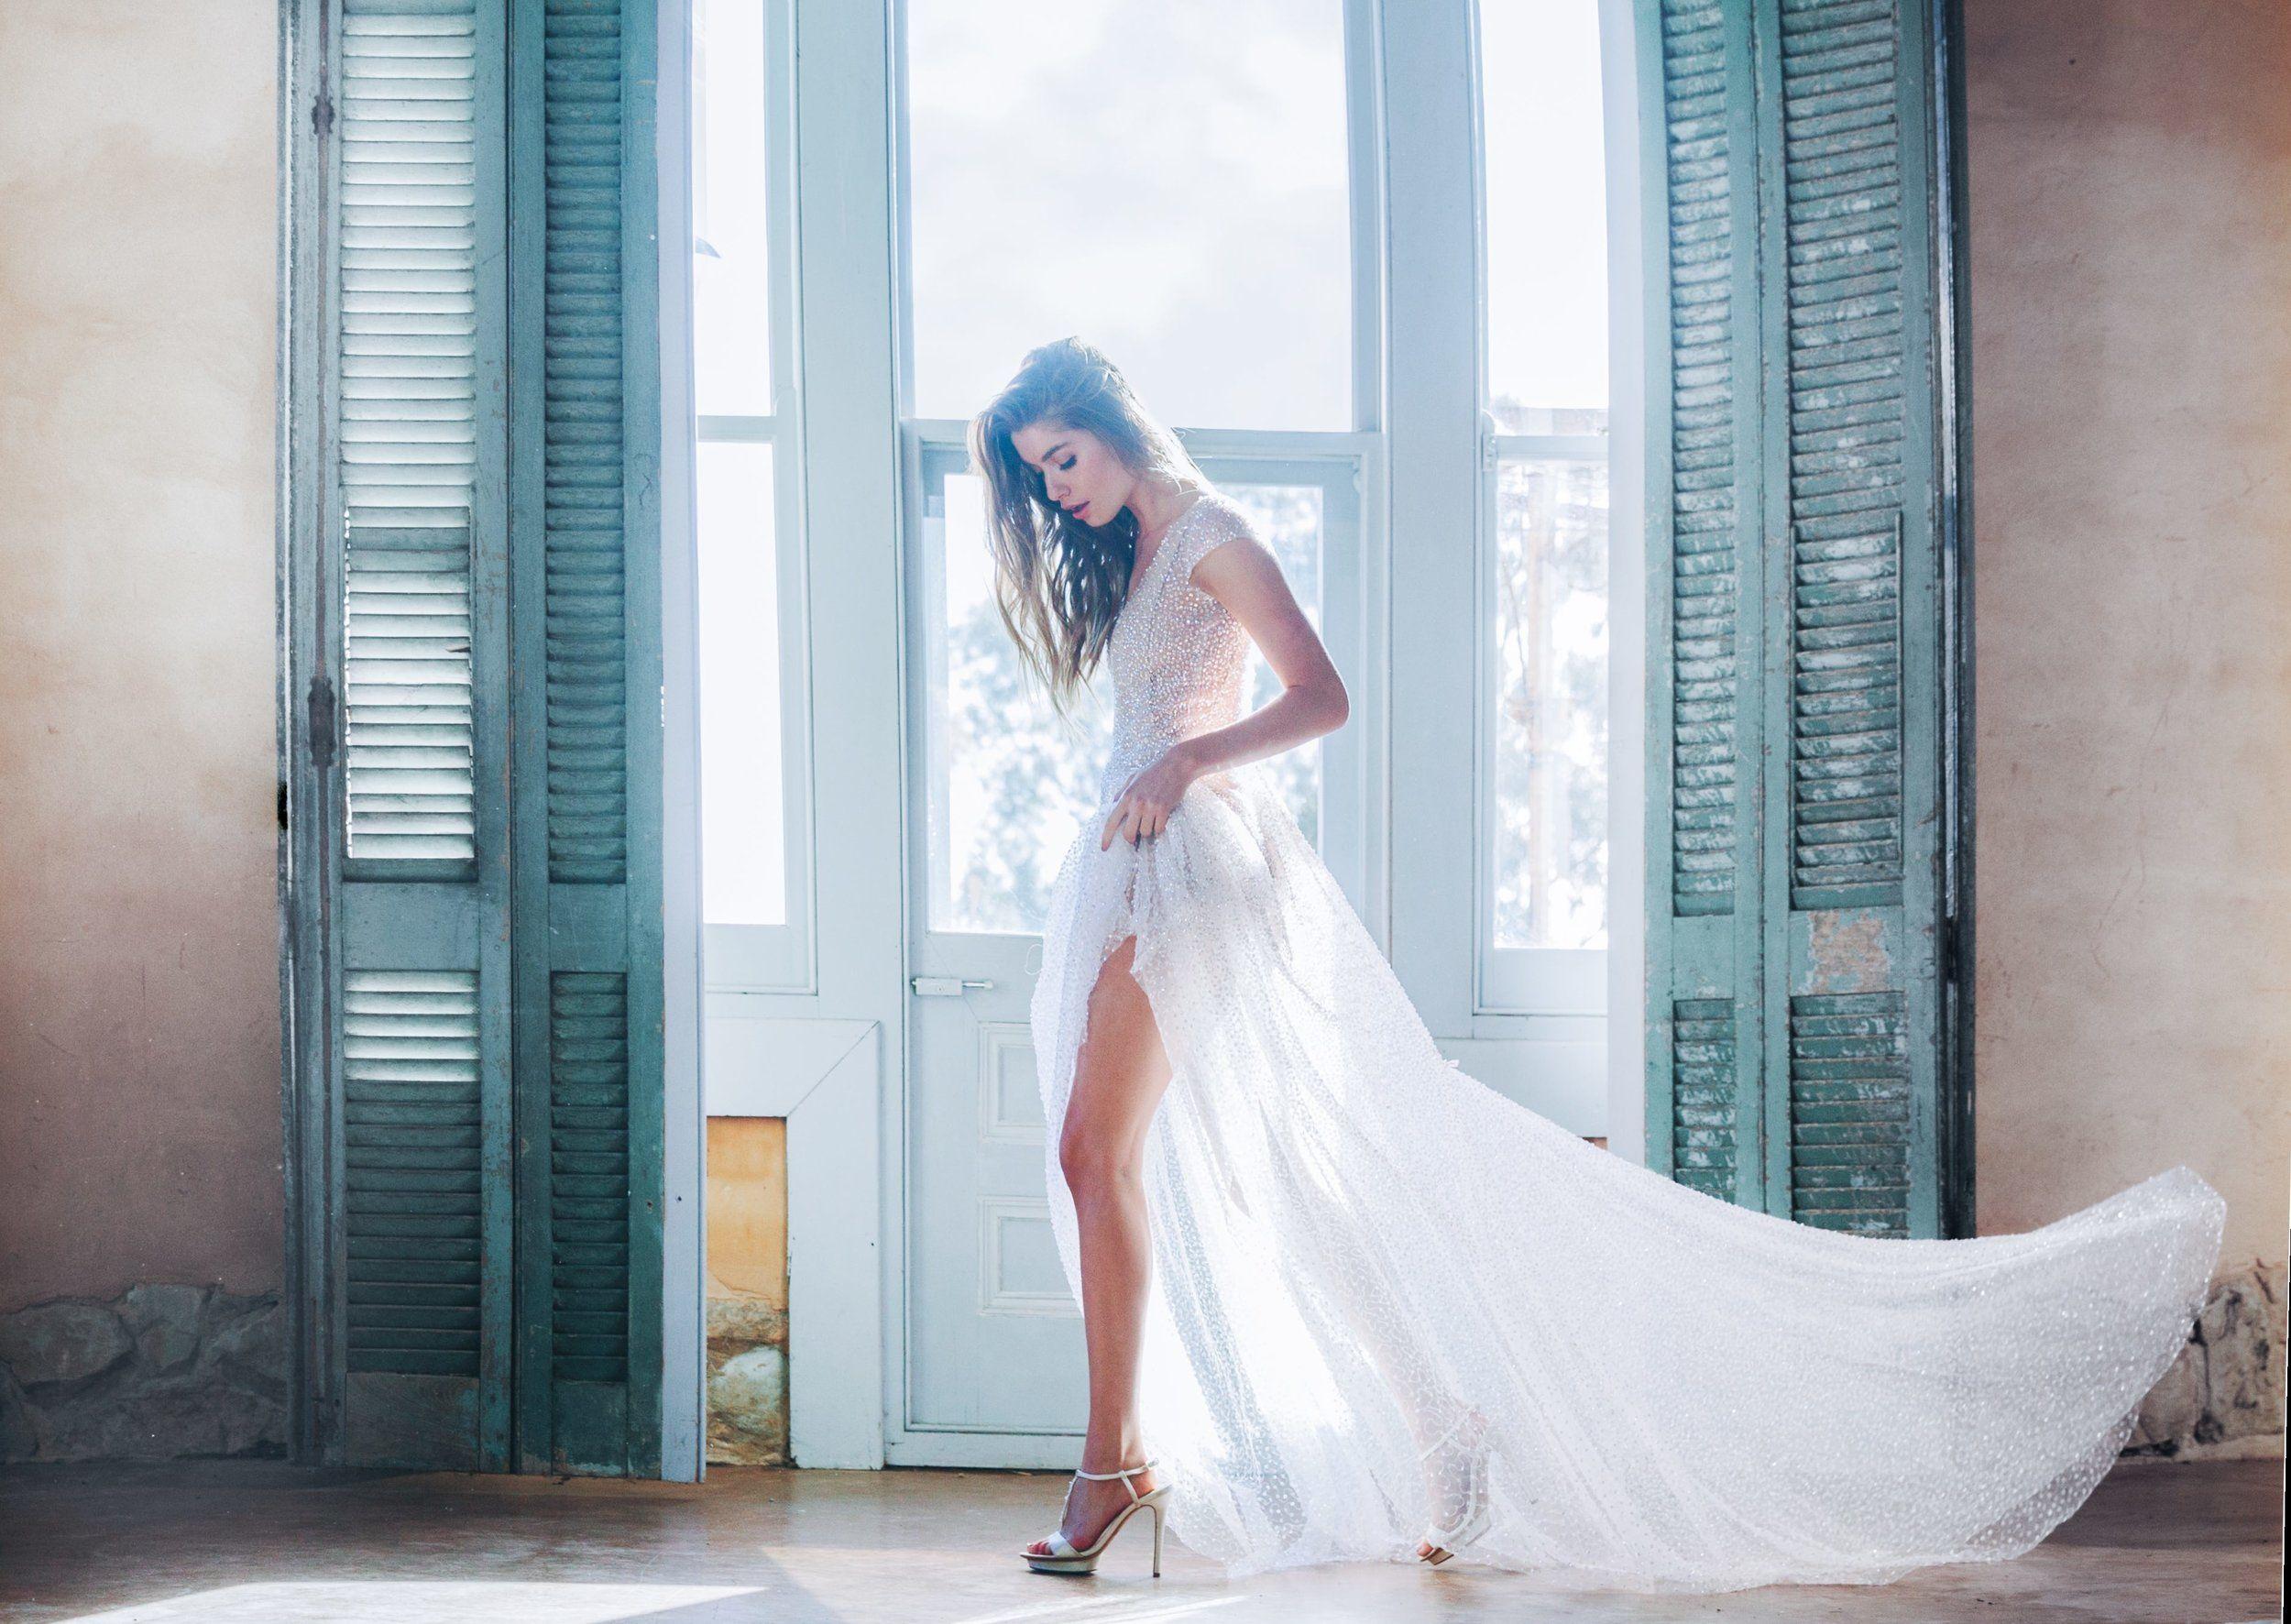 Photography | Ali Mitton | Wedding | Pinterest | Anna campbell, Anna ...